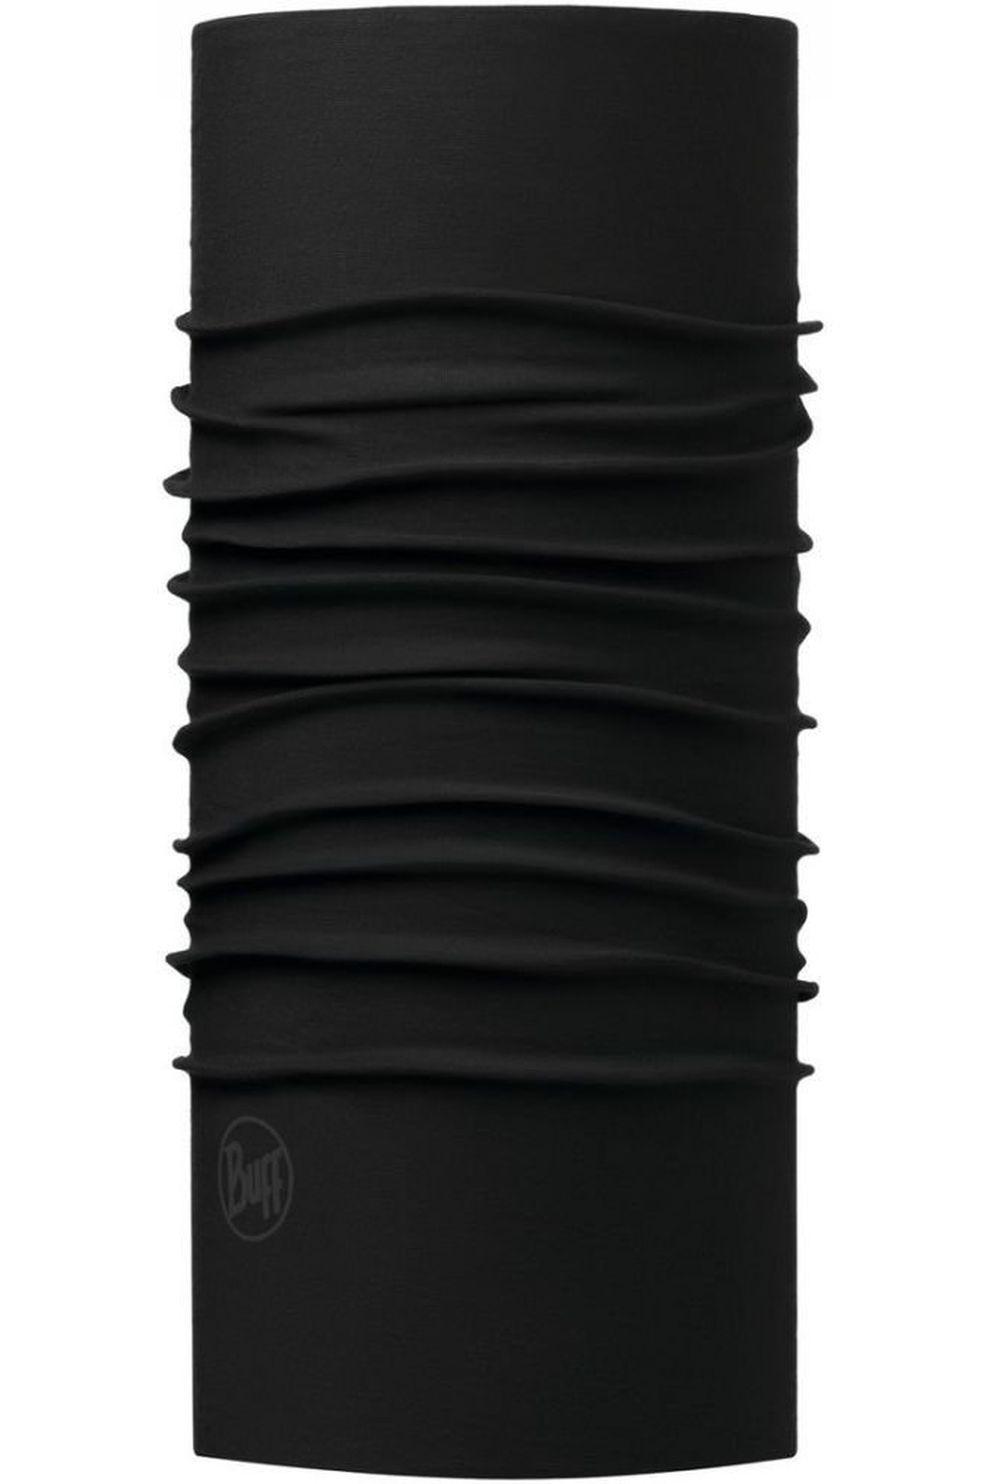 BUFF Buff Original Solid Black - Zwart